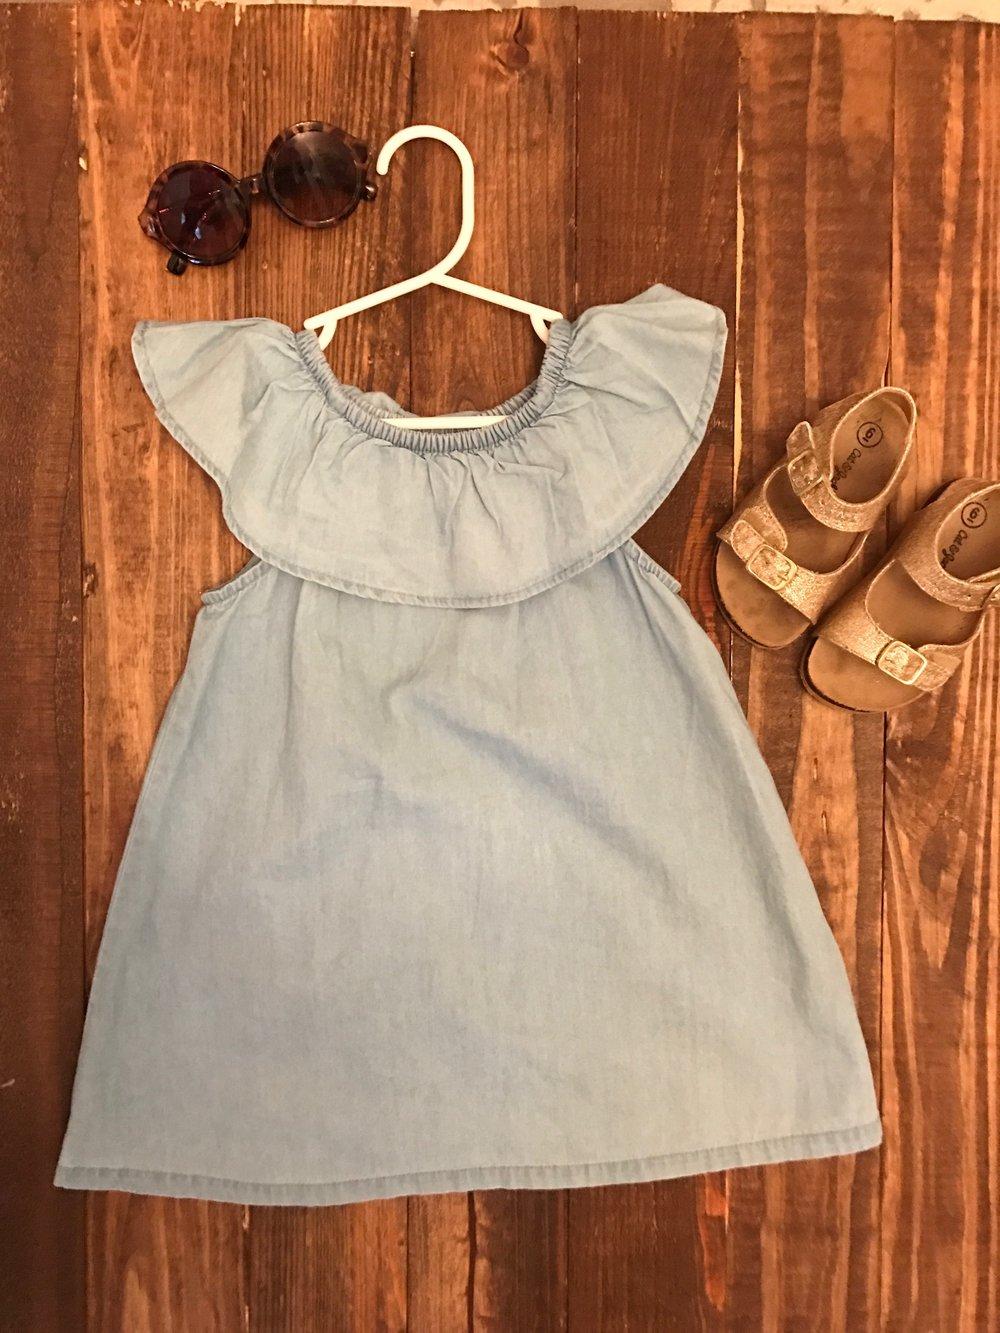 Old Navy dress, Cat & Jack sandals, Crewcuts sunglasses